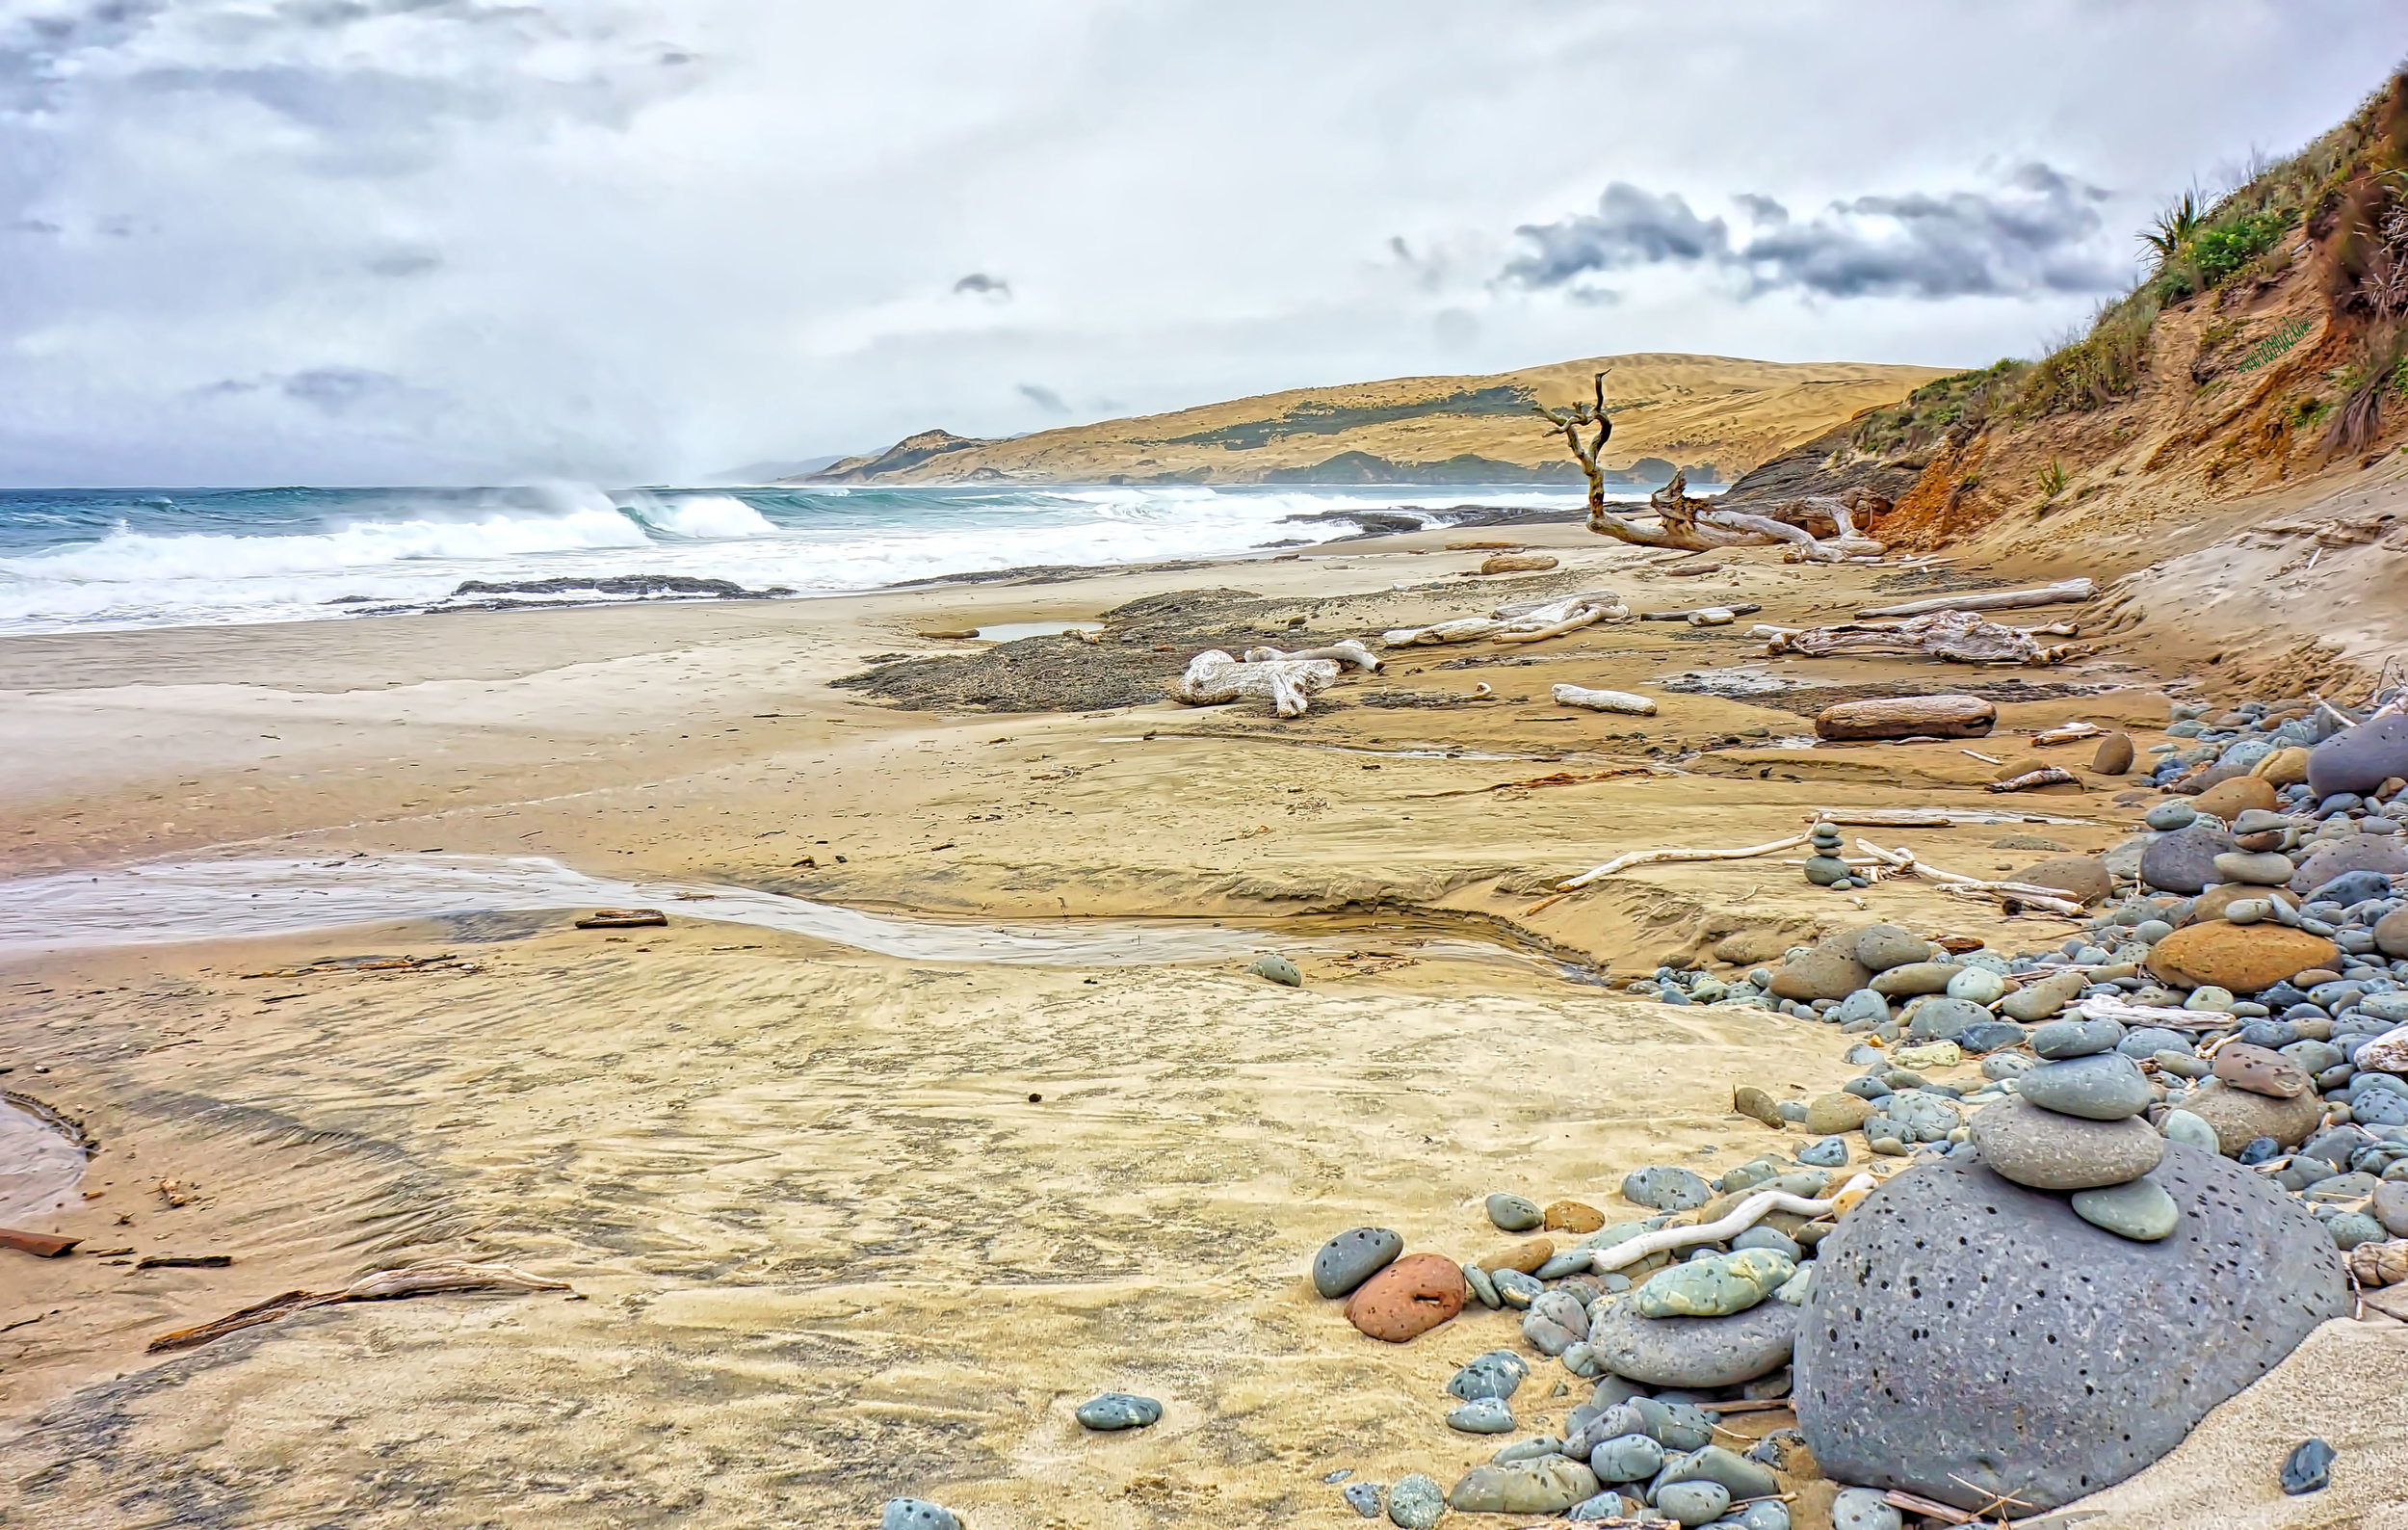 Beach near Opononi/Omāpere, Northland, New Zealand